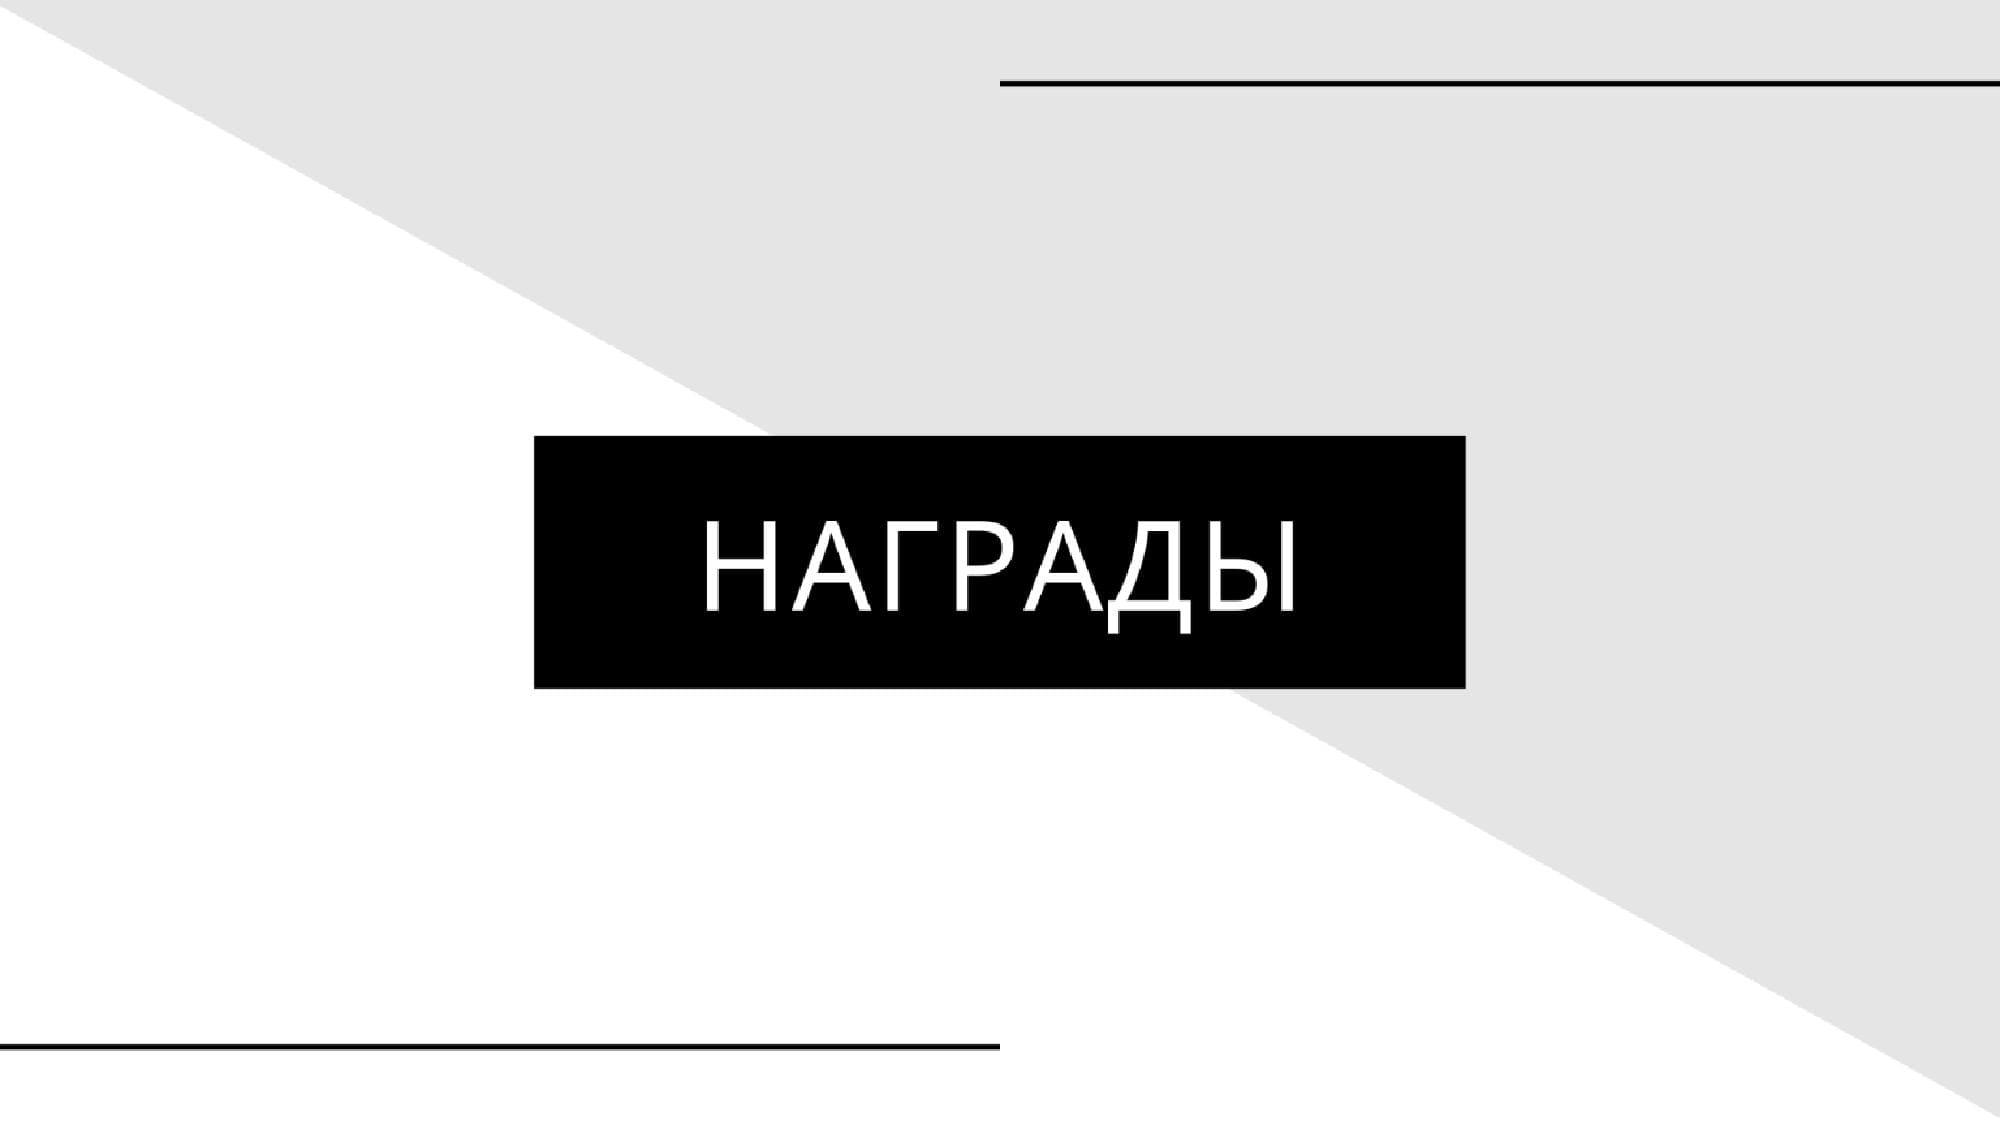 Награды - Лукиных Евгений Лукич